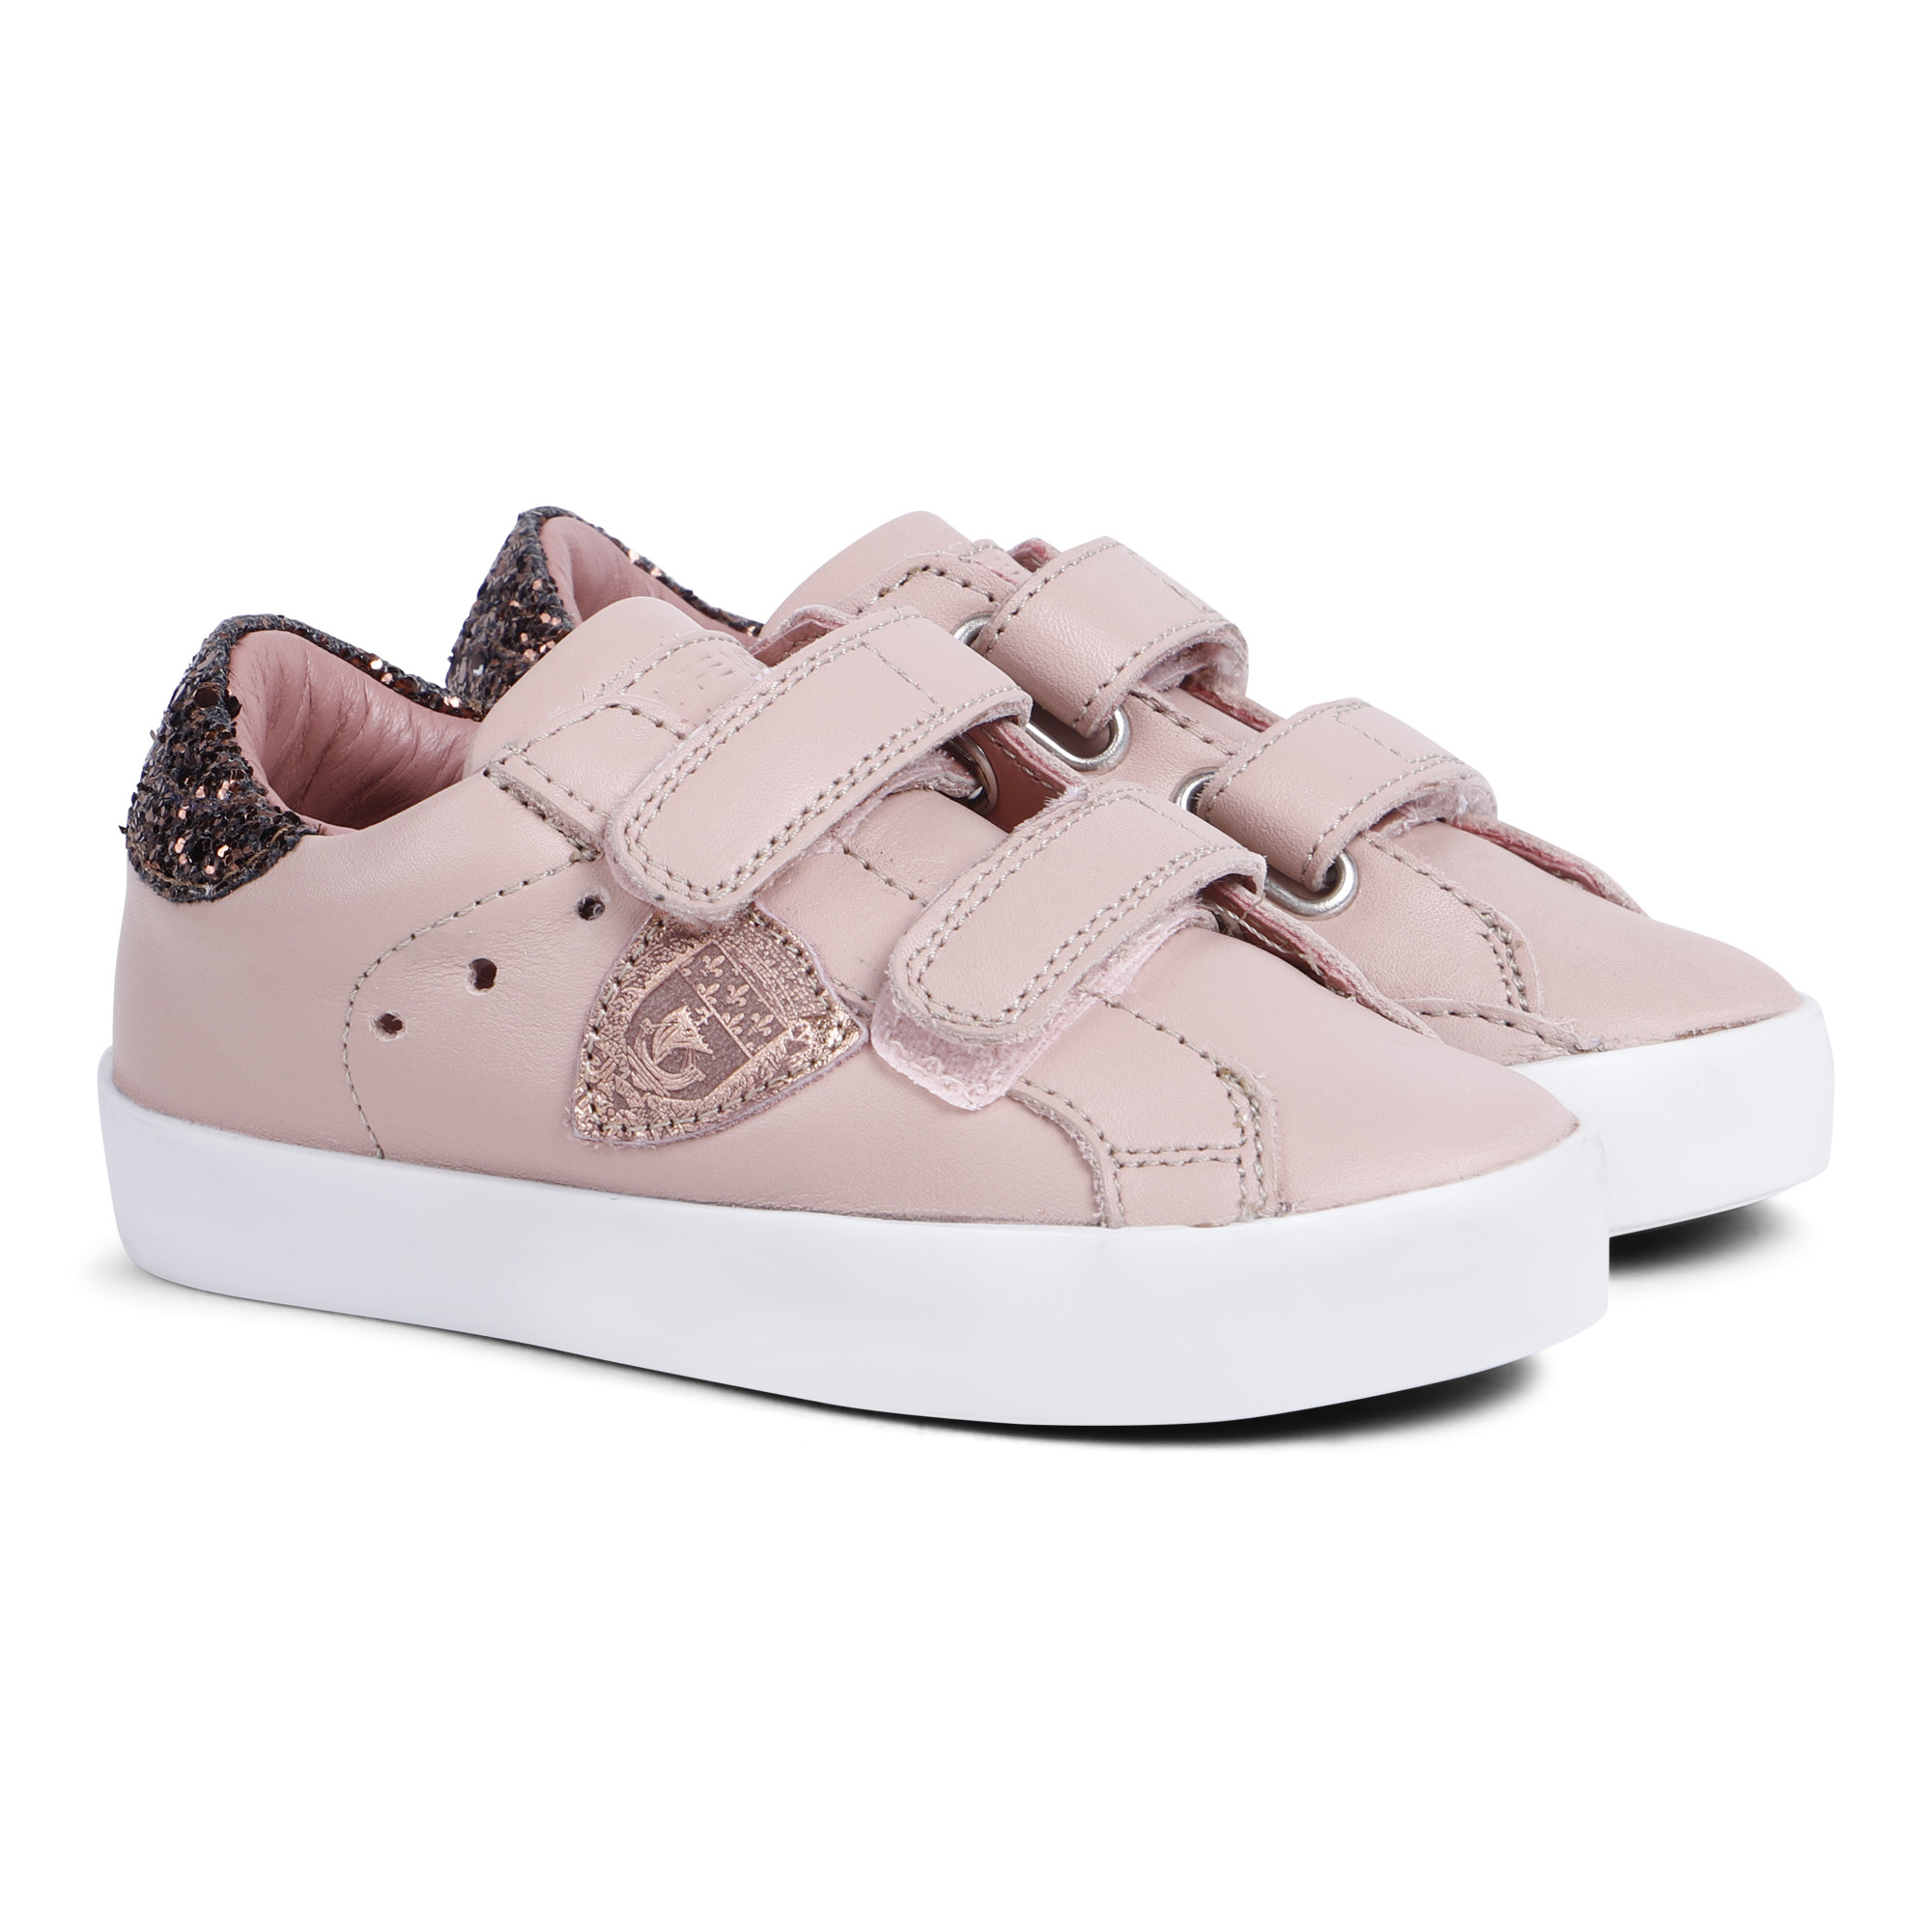 Philippe Model Baby Velcro Sneakers in